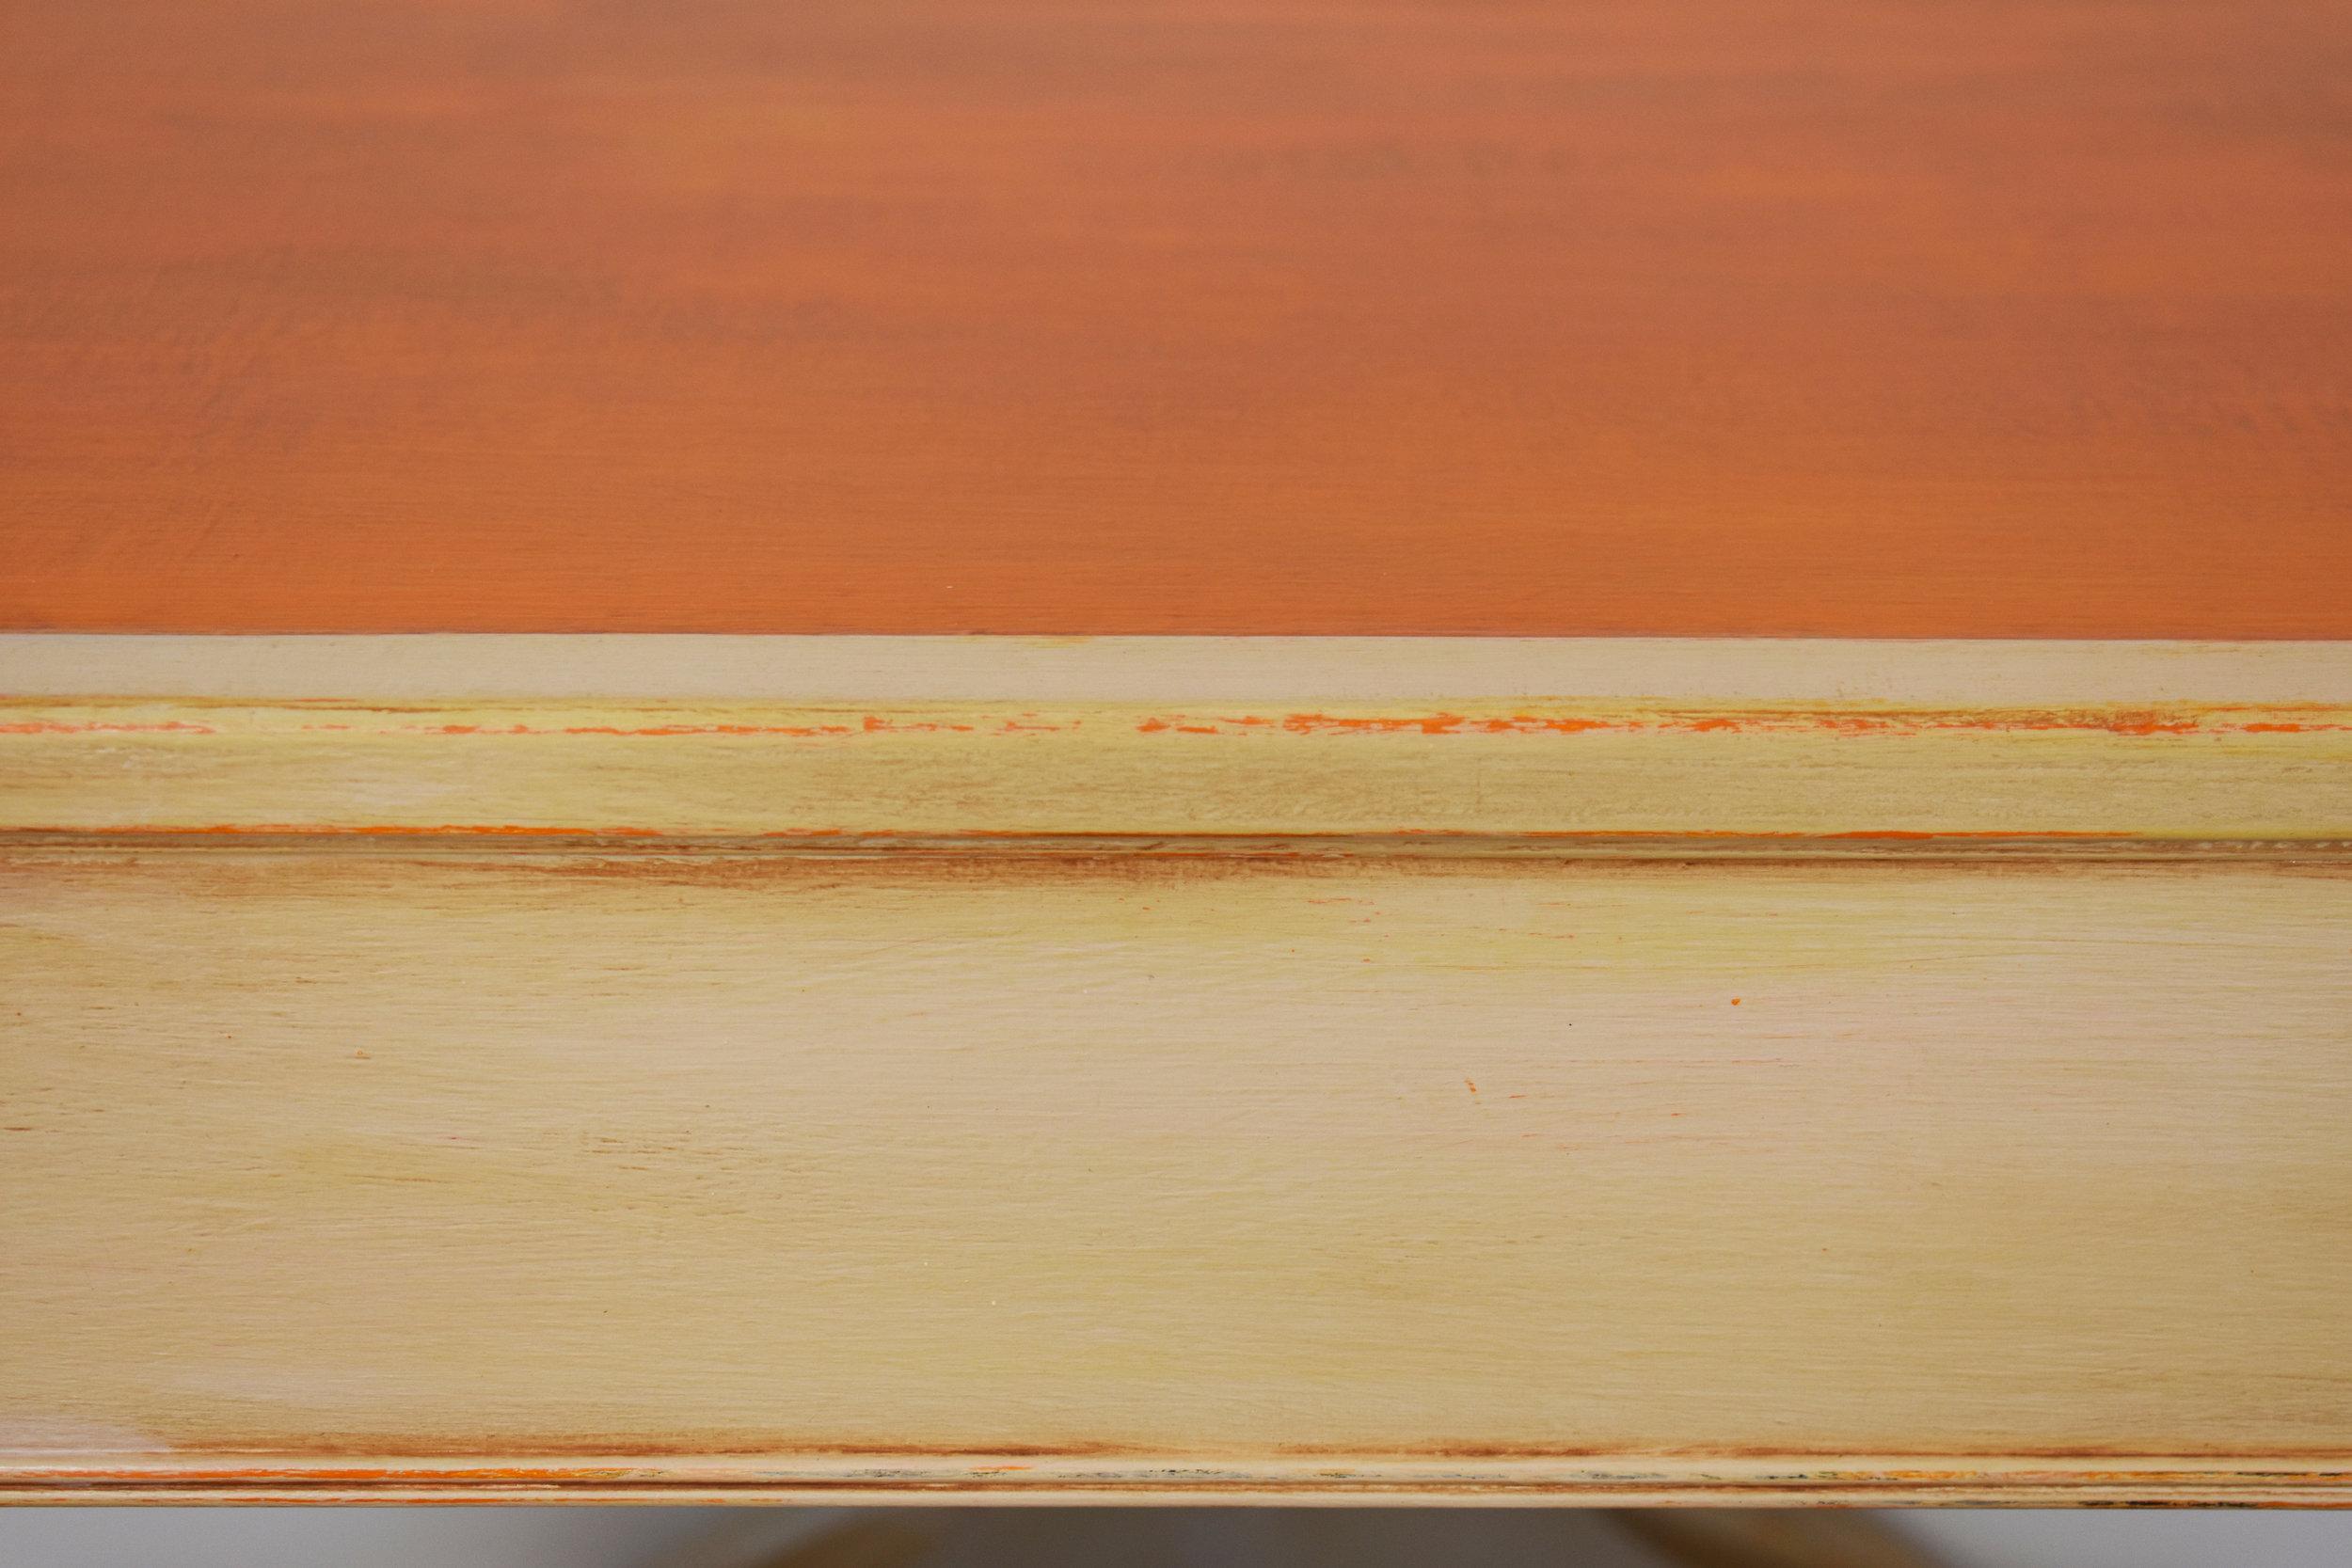 Off-white paint finish, distressing shows orange peeking through